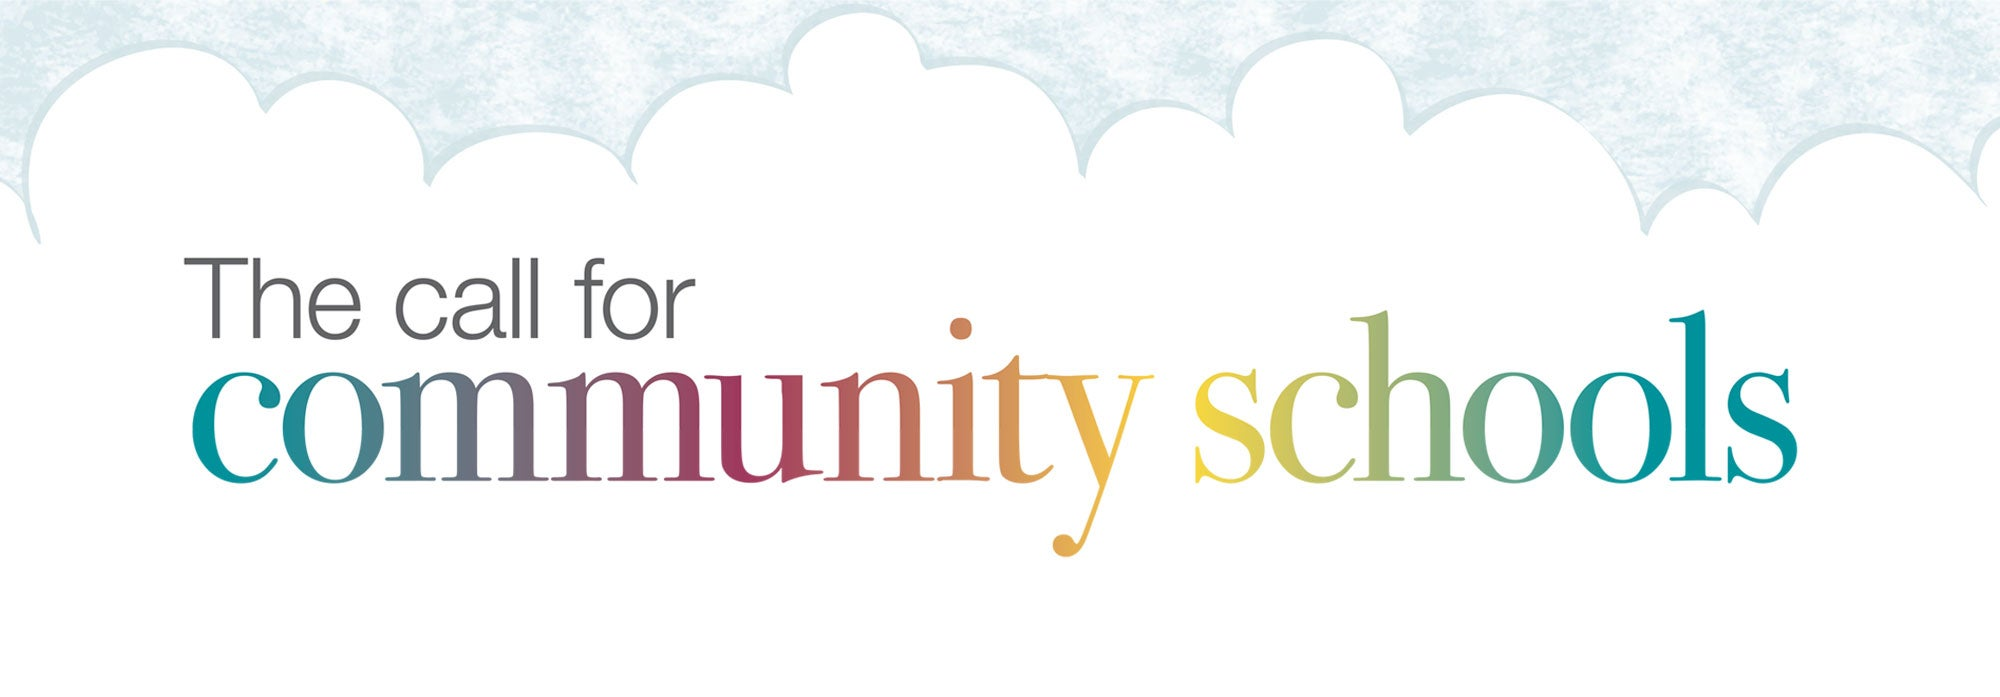 call for community schools